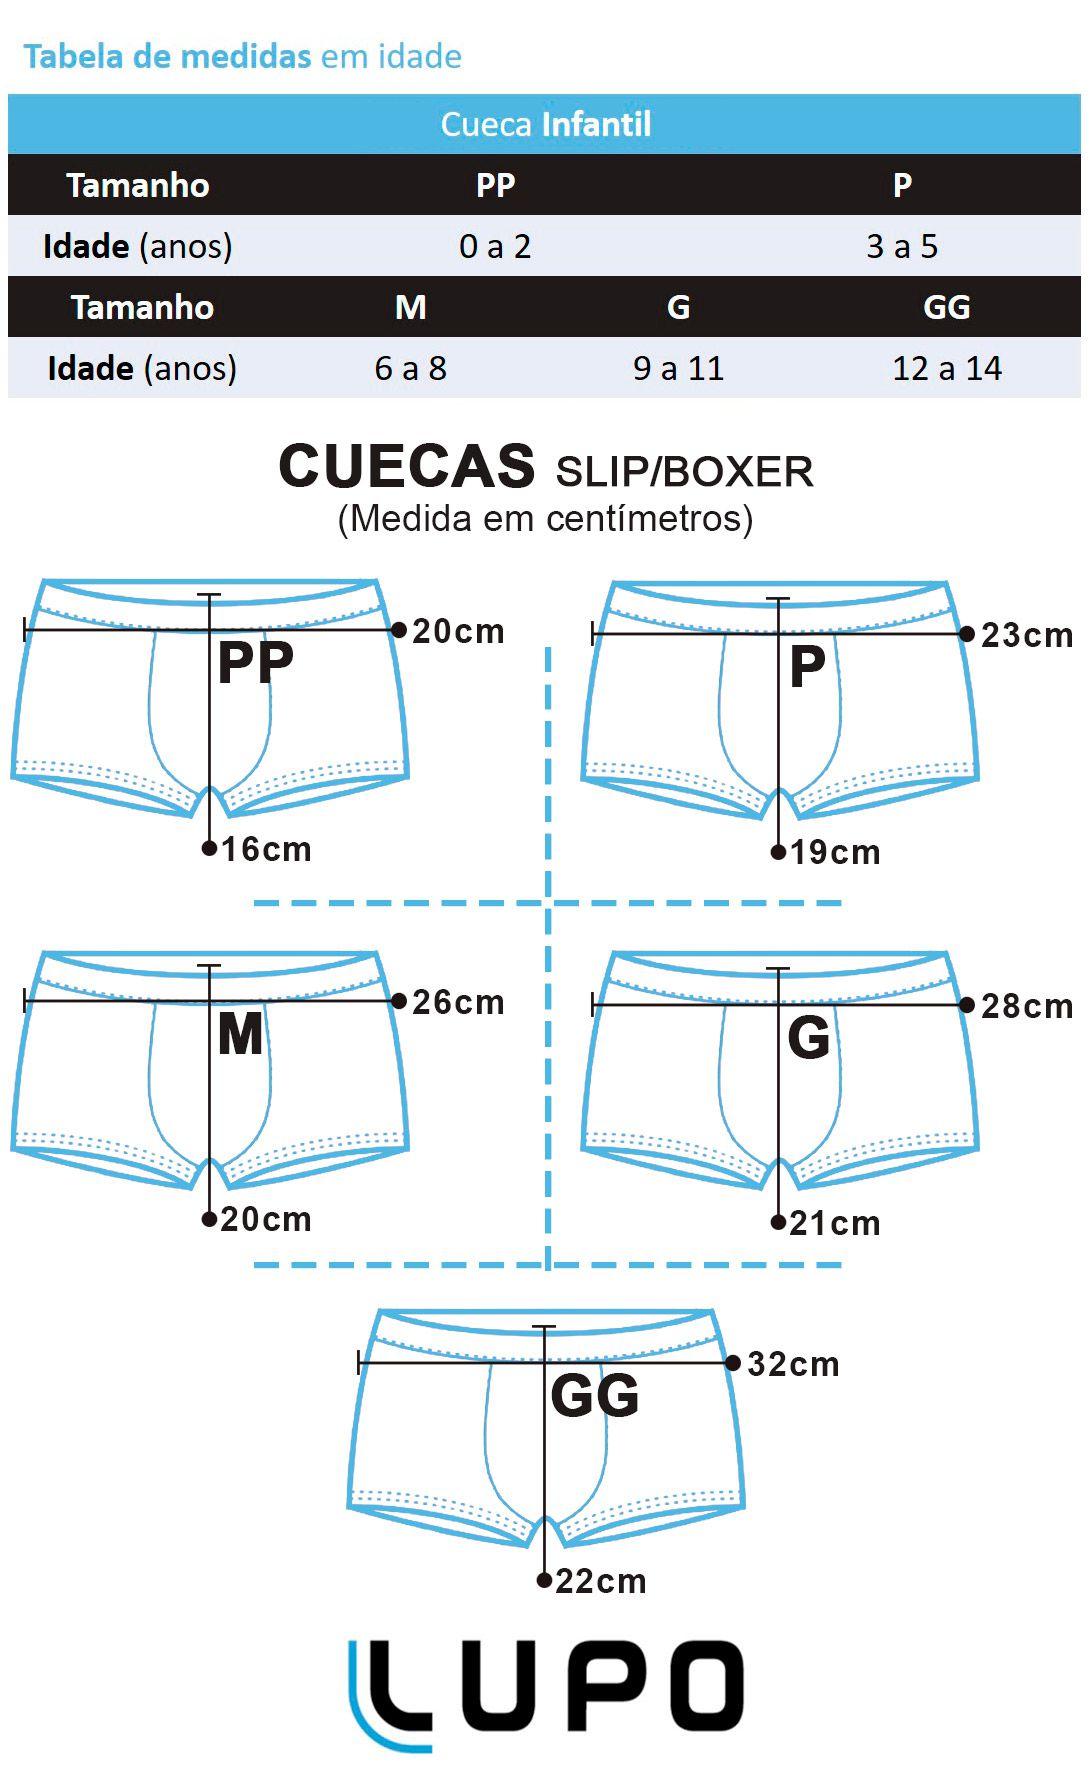 Cueca Infantil Slip Kit 3 cuecas Superman Lupo